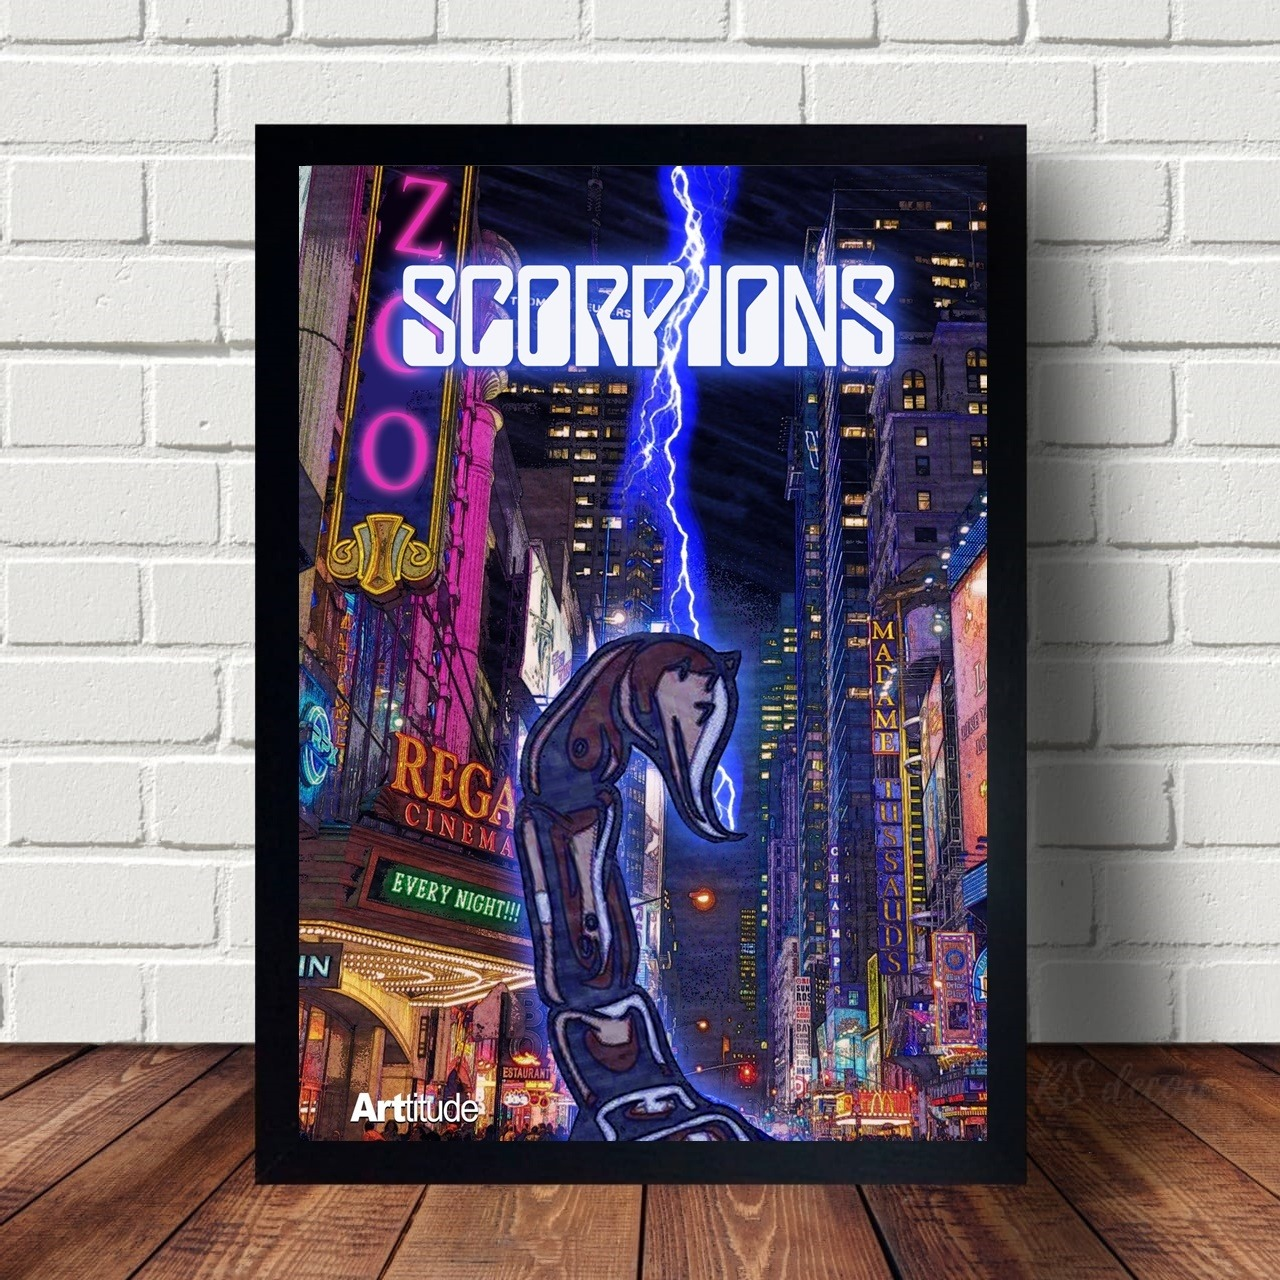 Quadro Decorativo Scorpions I